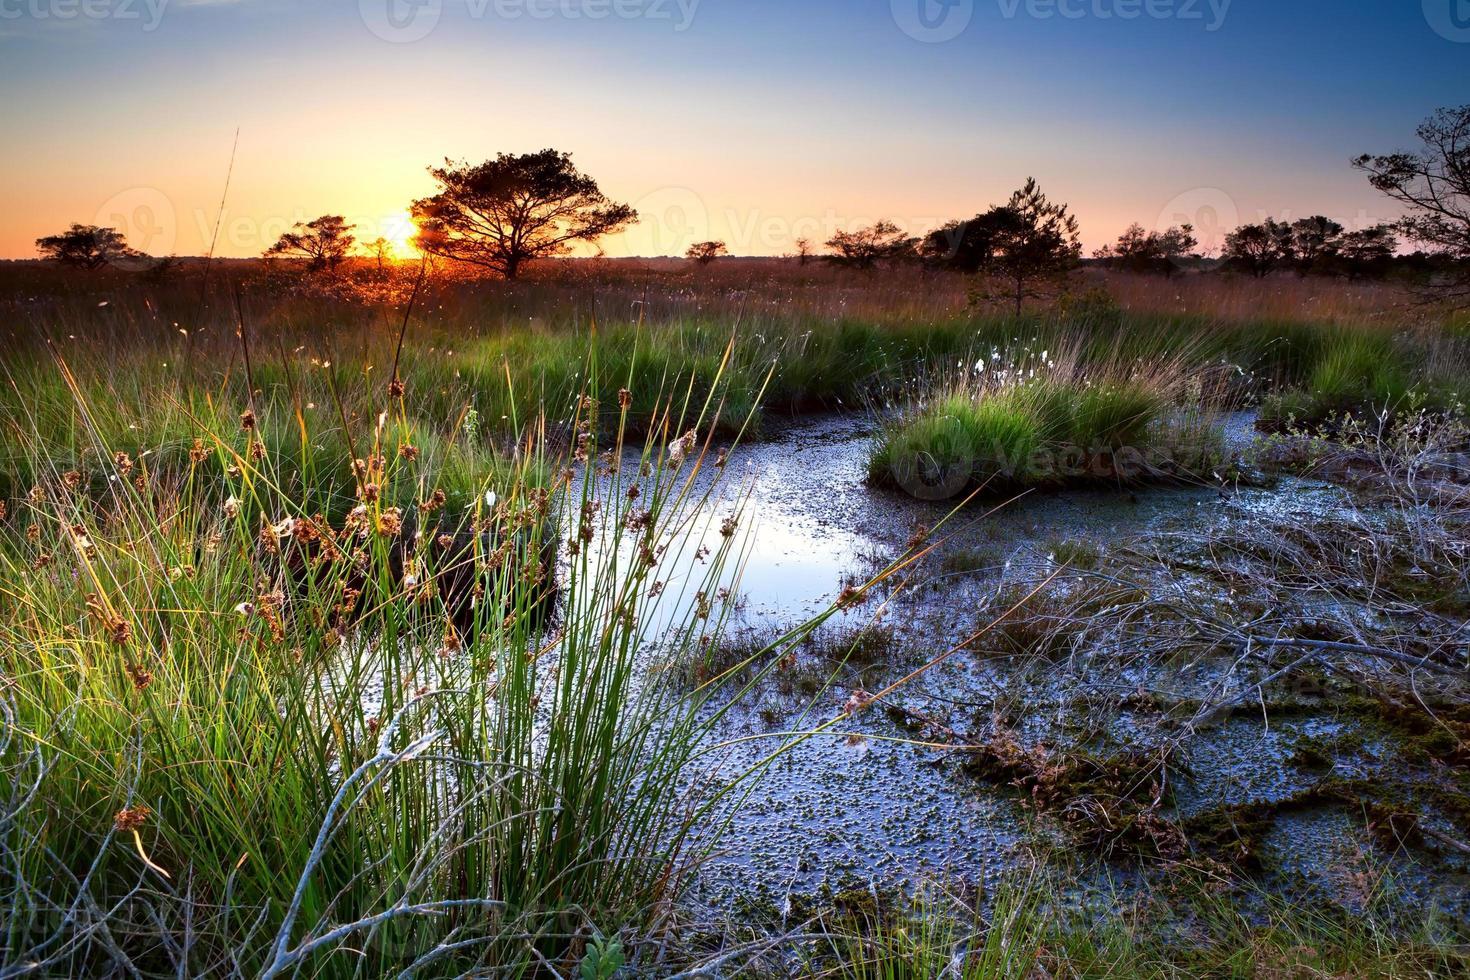 zomer zonsondergang over moeras foto